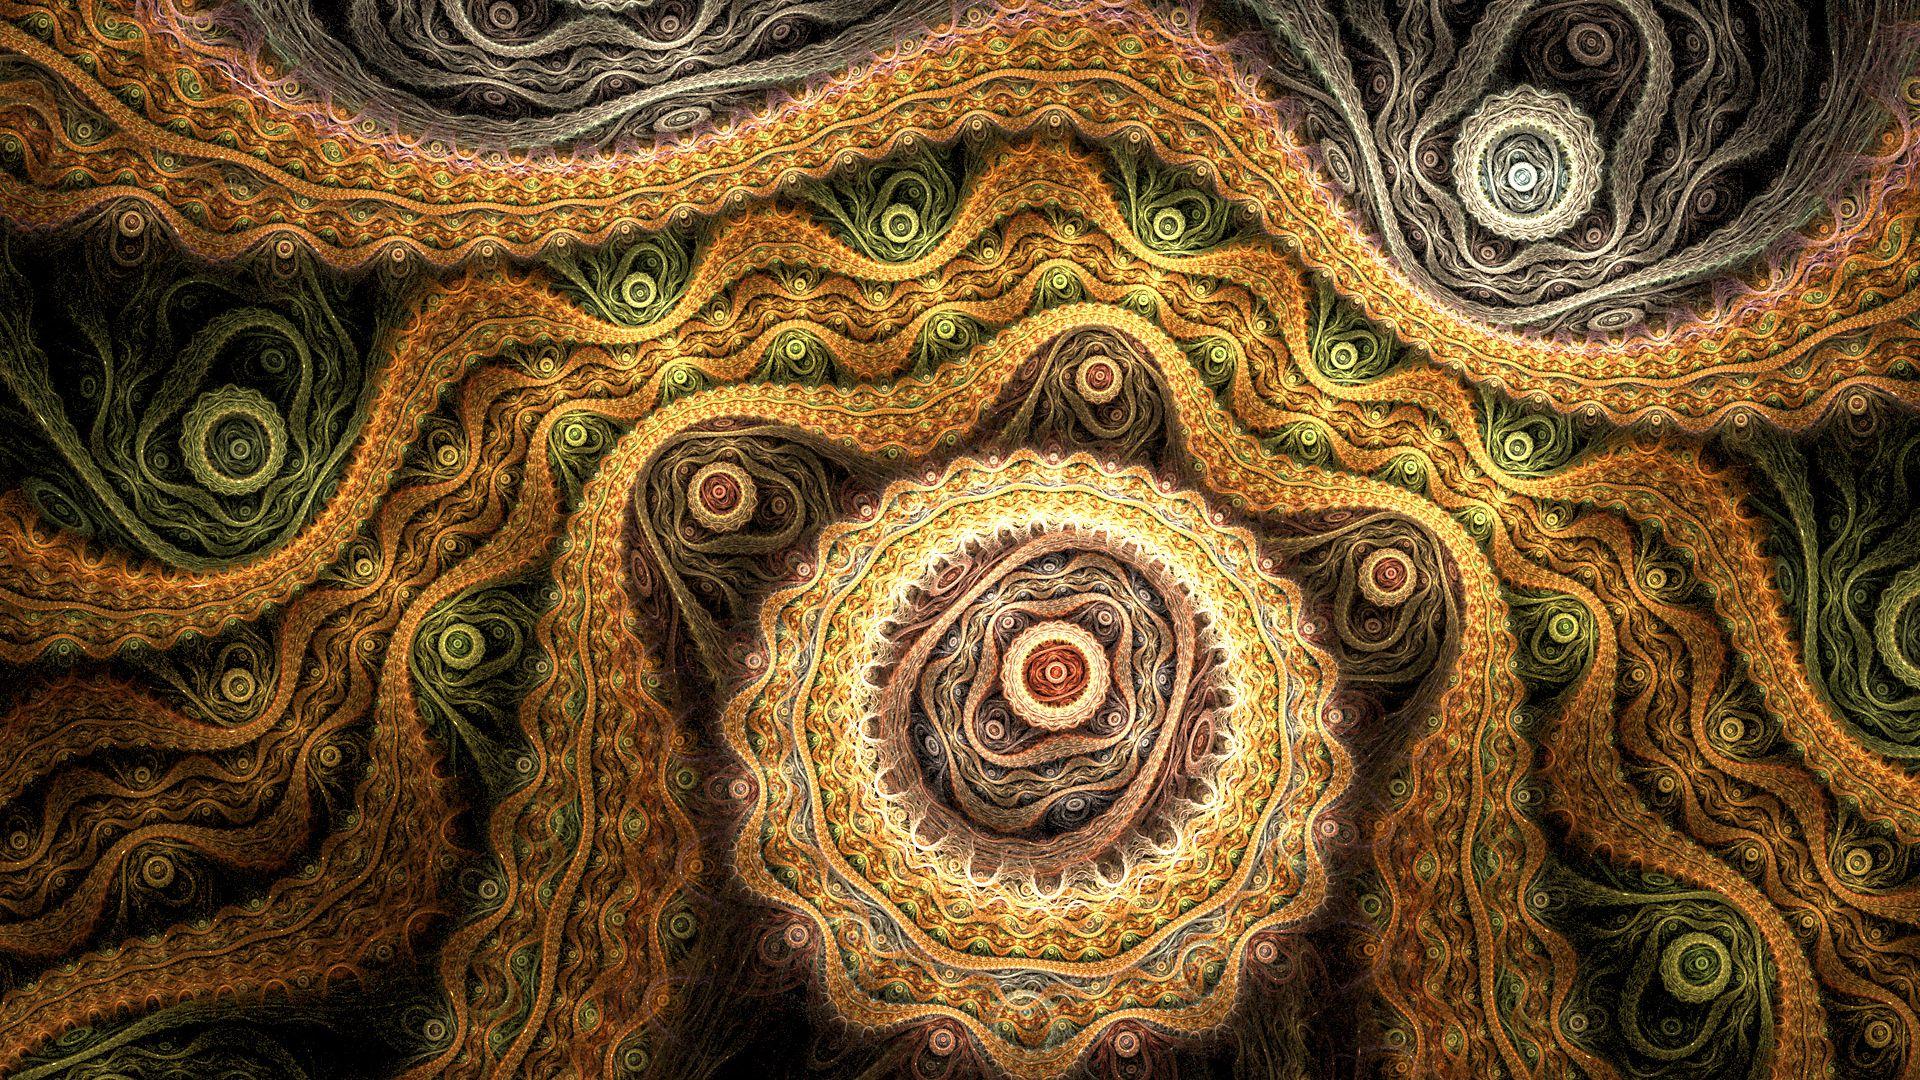 Alex Grey Pesquisa Google Fractals Psychedelic Wallpaper Abstract Wallpapers